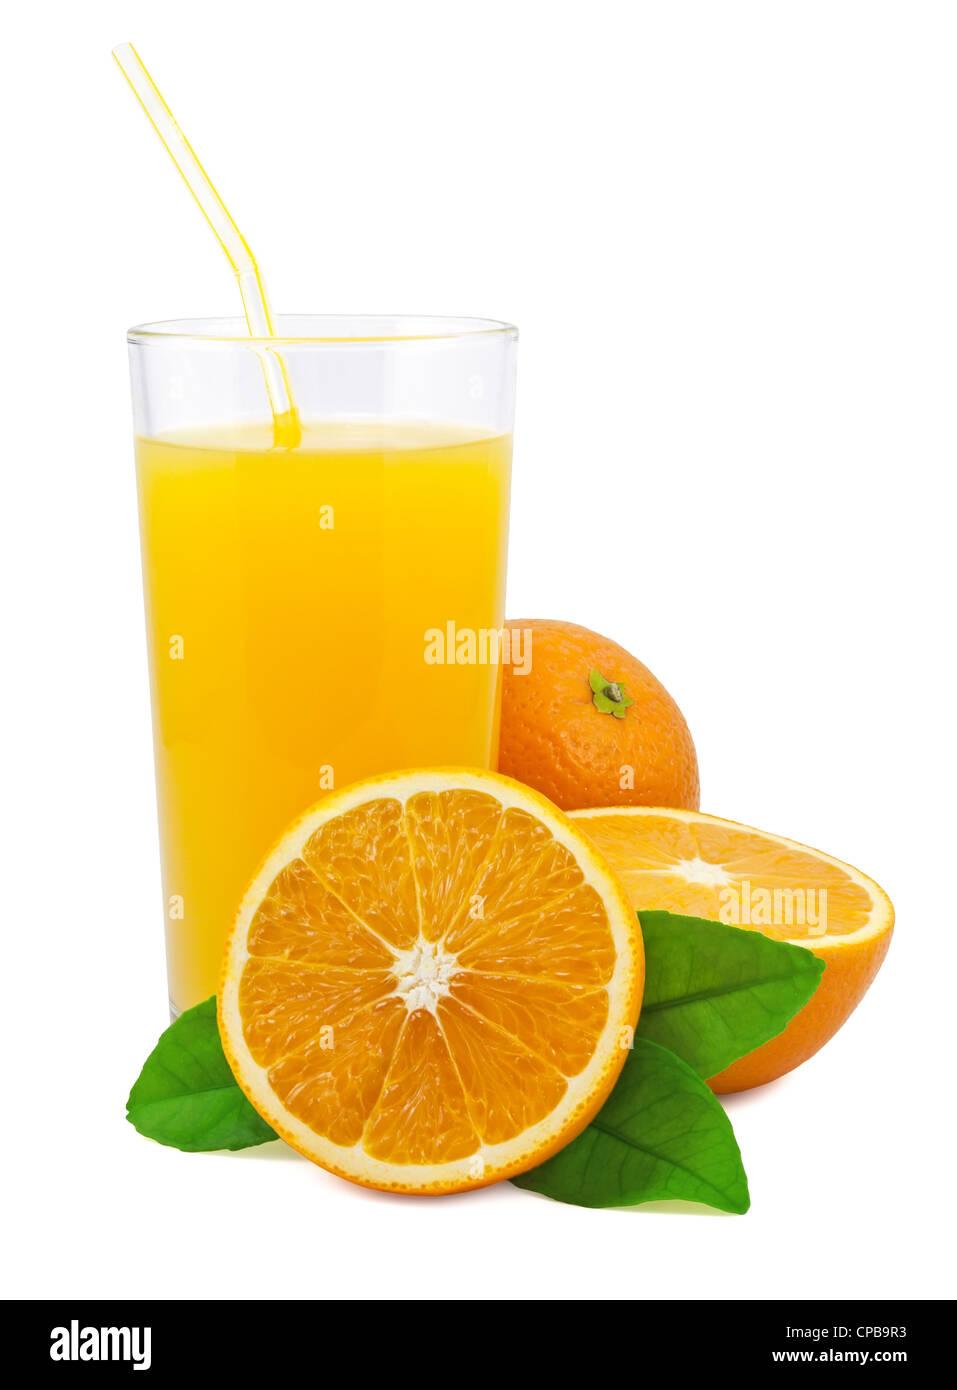 Orange juice and oranges with leaves on white background - Stock Image